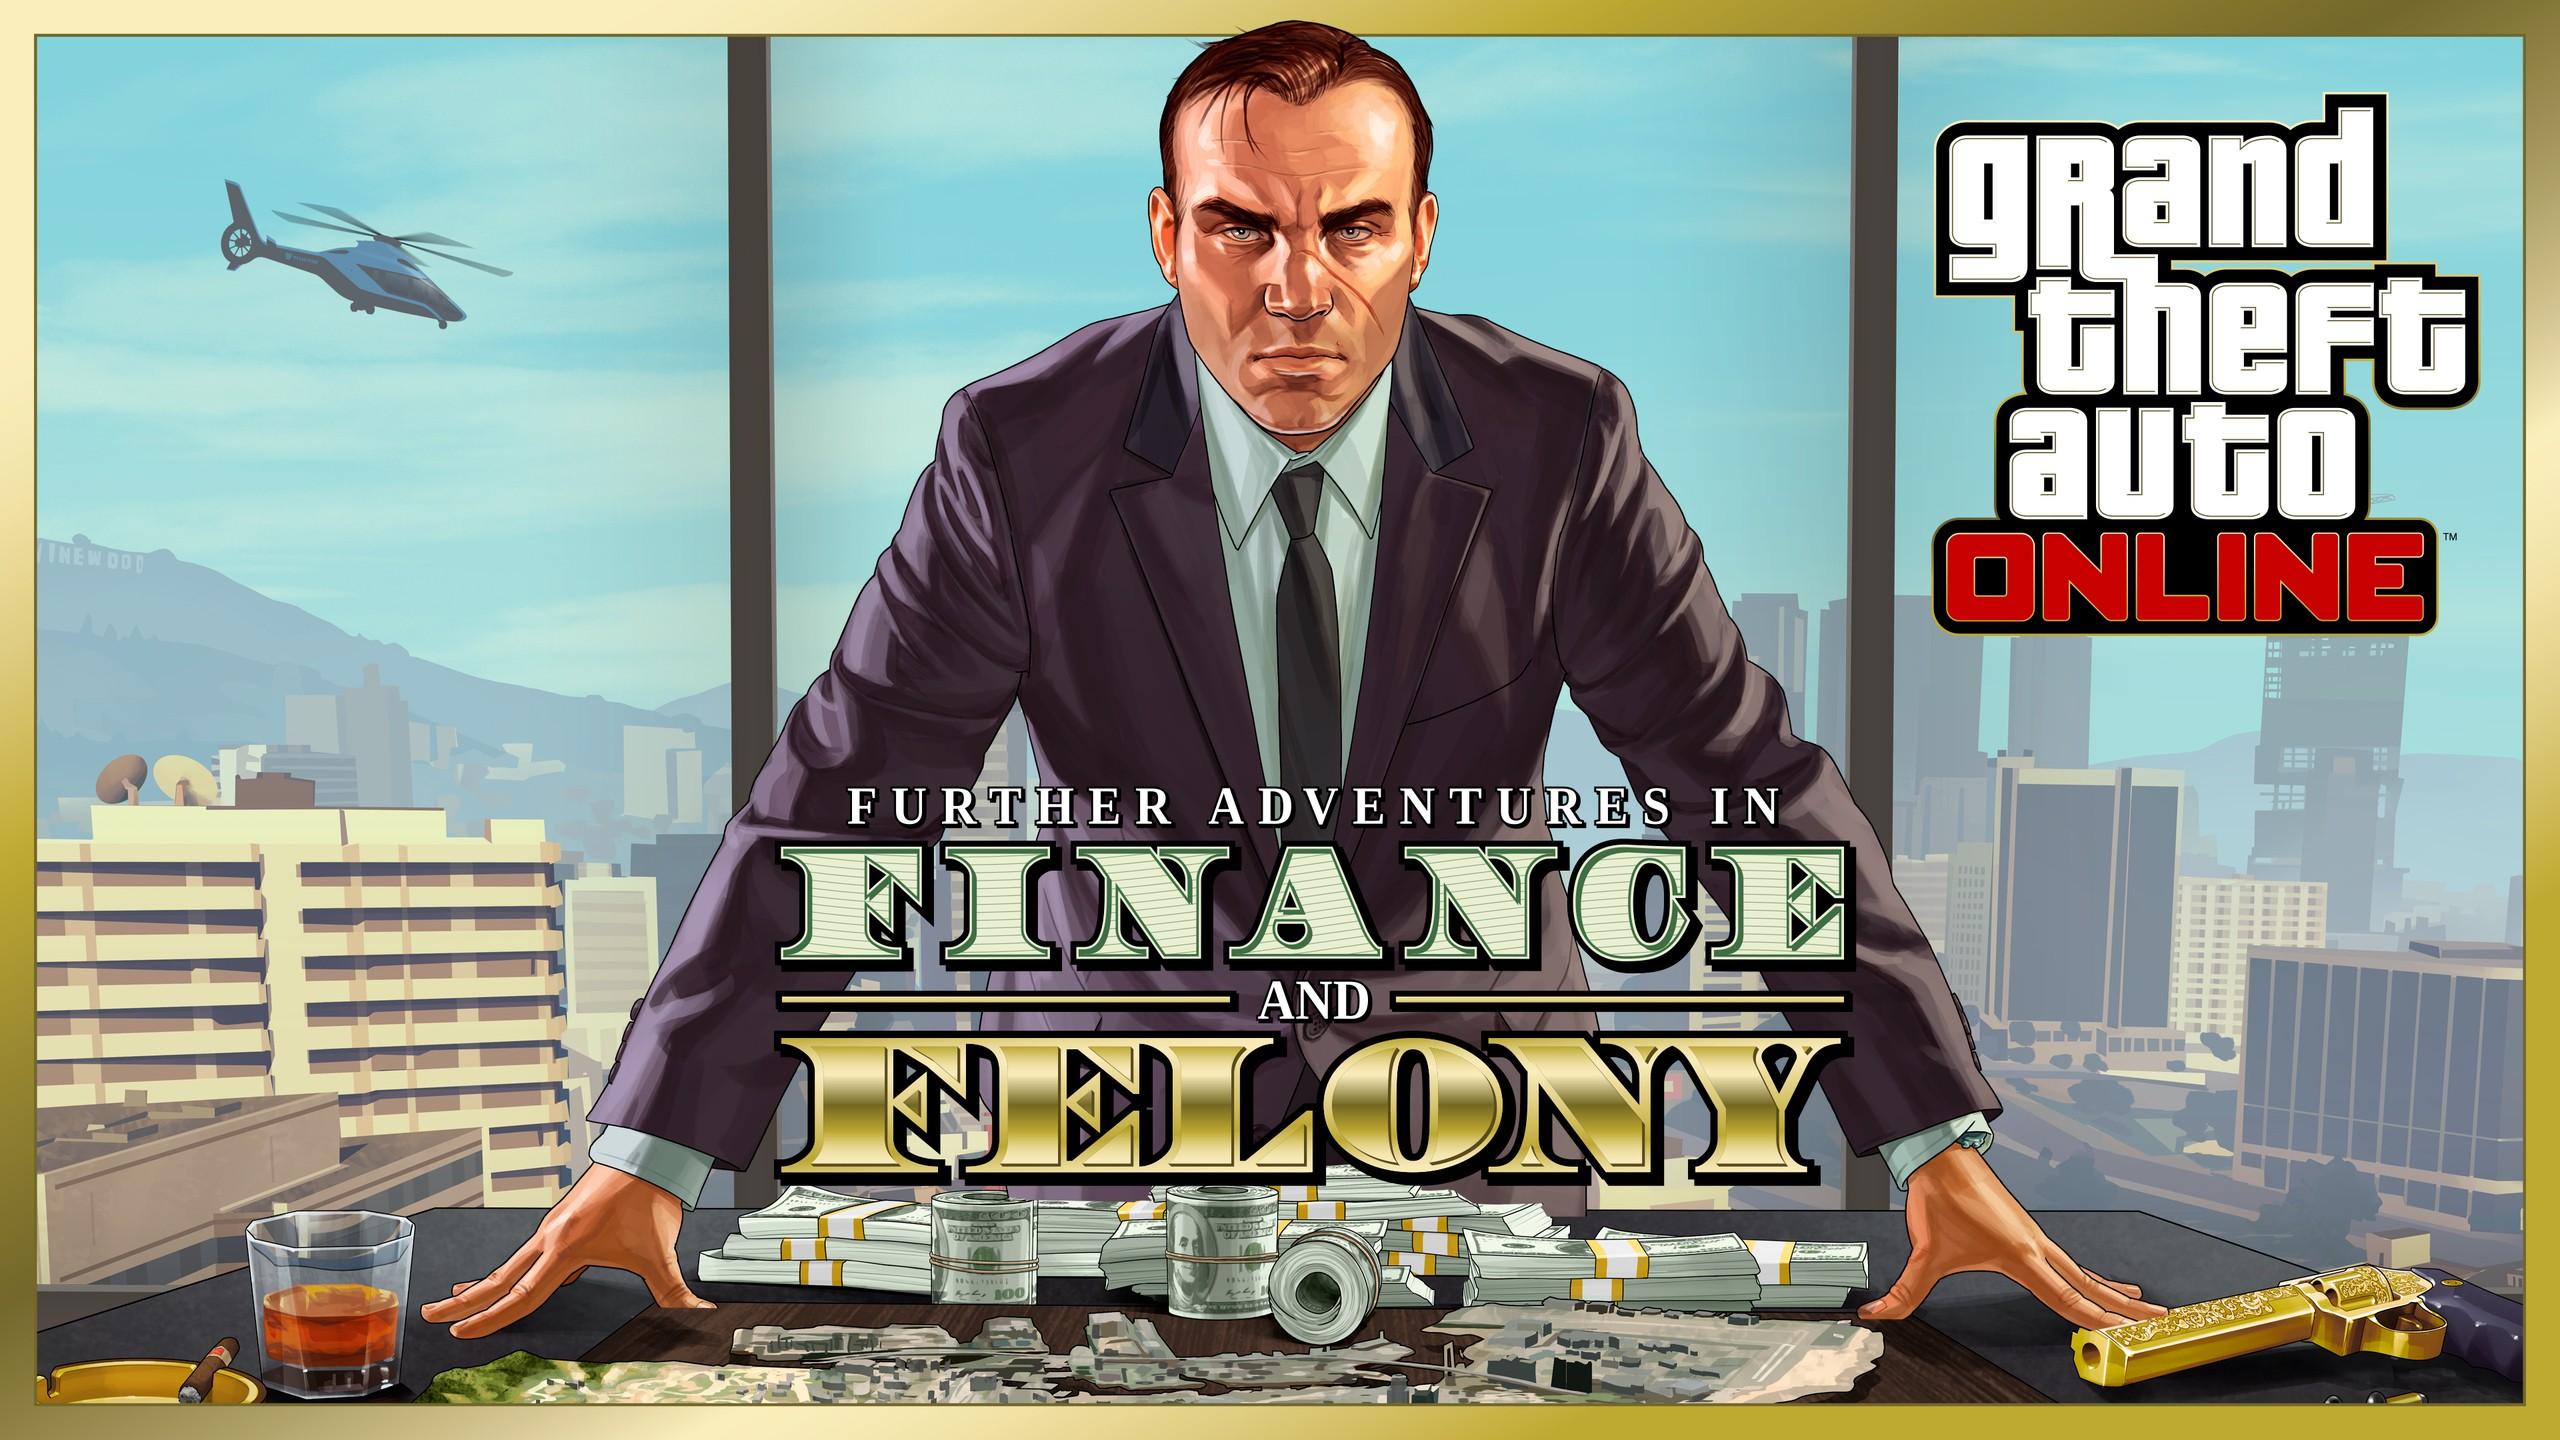 Fondos De Pantalla Grand Theft Auto V Juegos De Pc